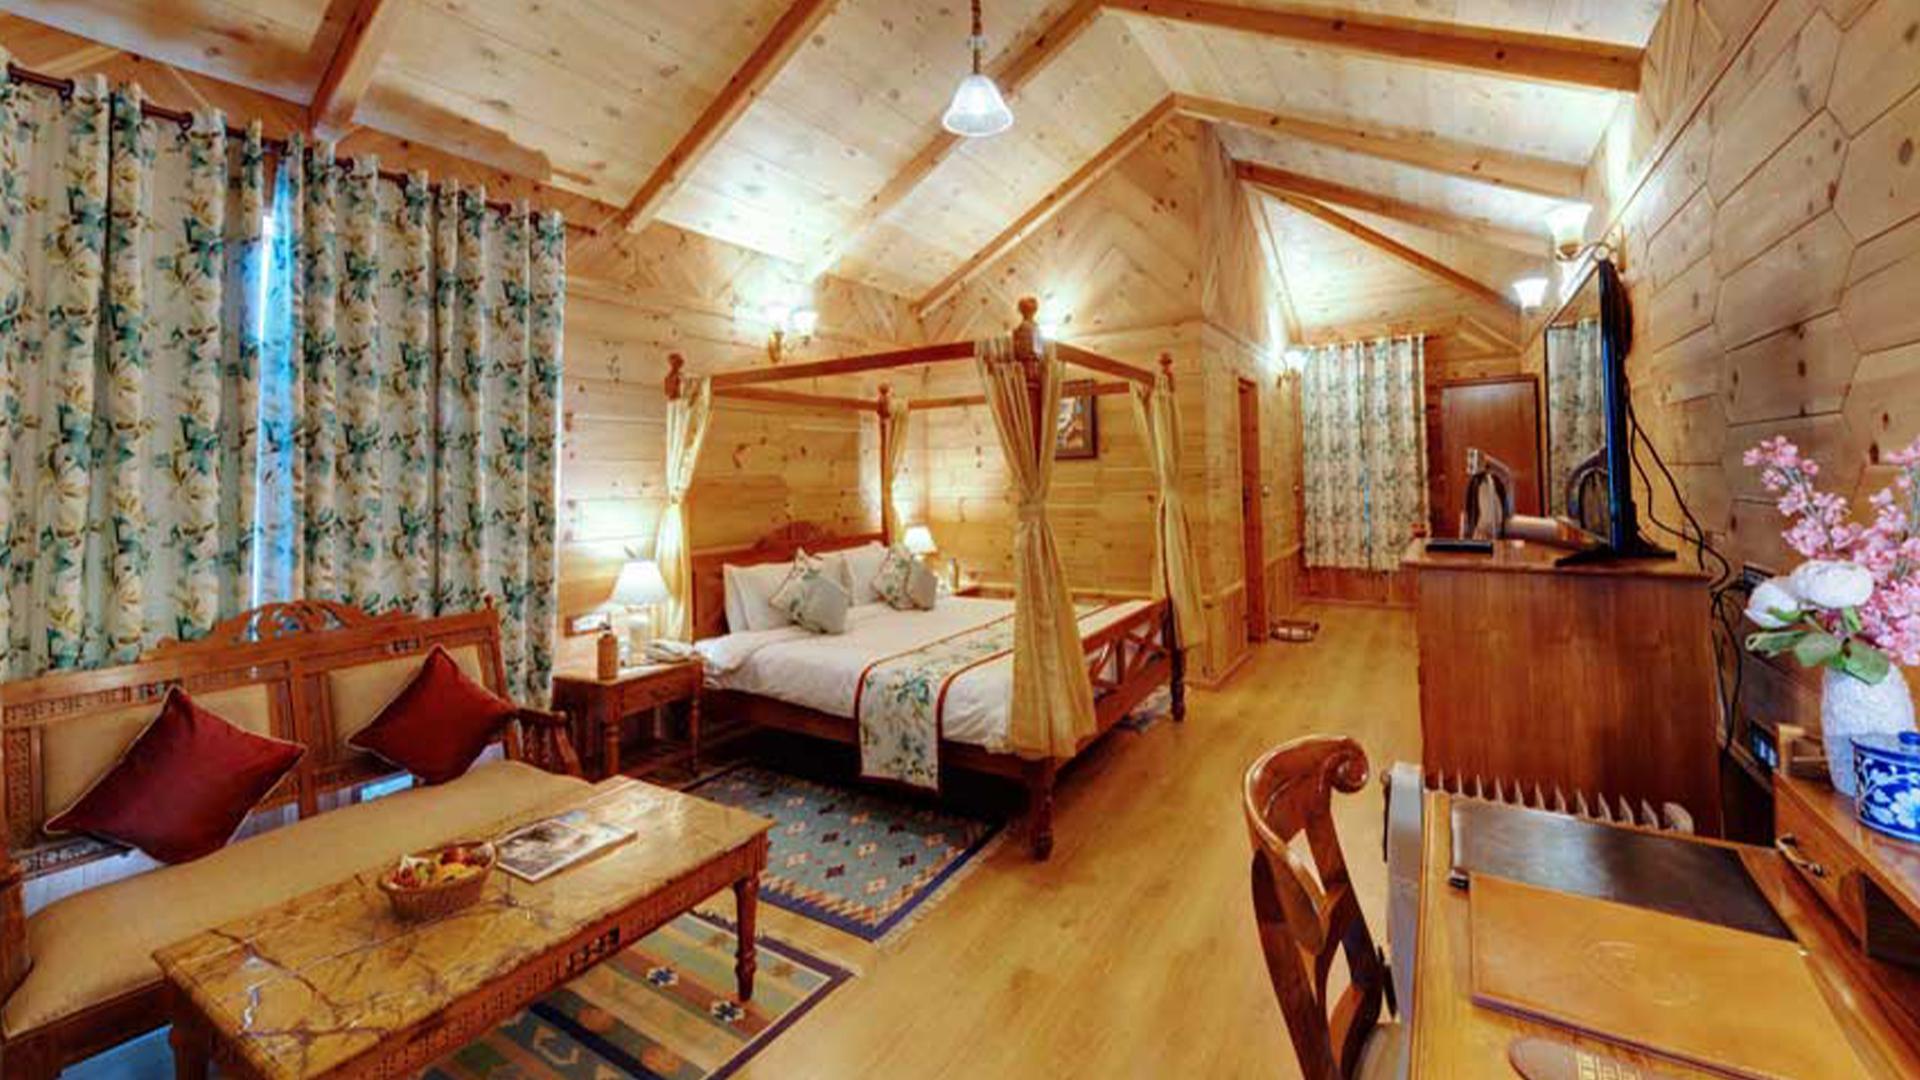 Superior Room image 1 at WelcomHeritage Urvashi's Retreat by Kullu, Himachal Pradesh, India